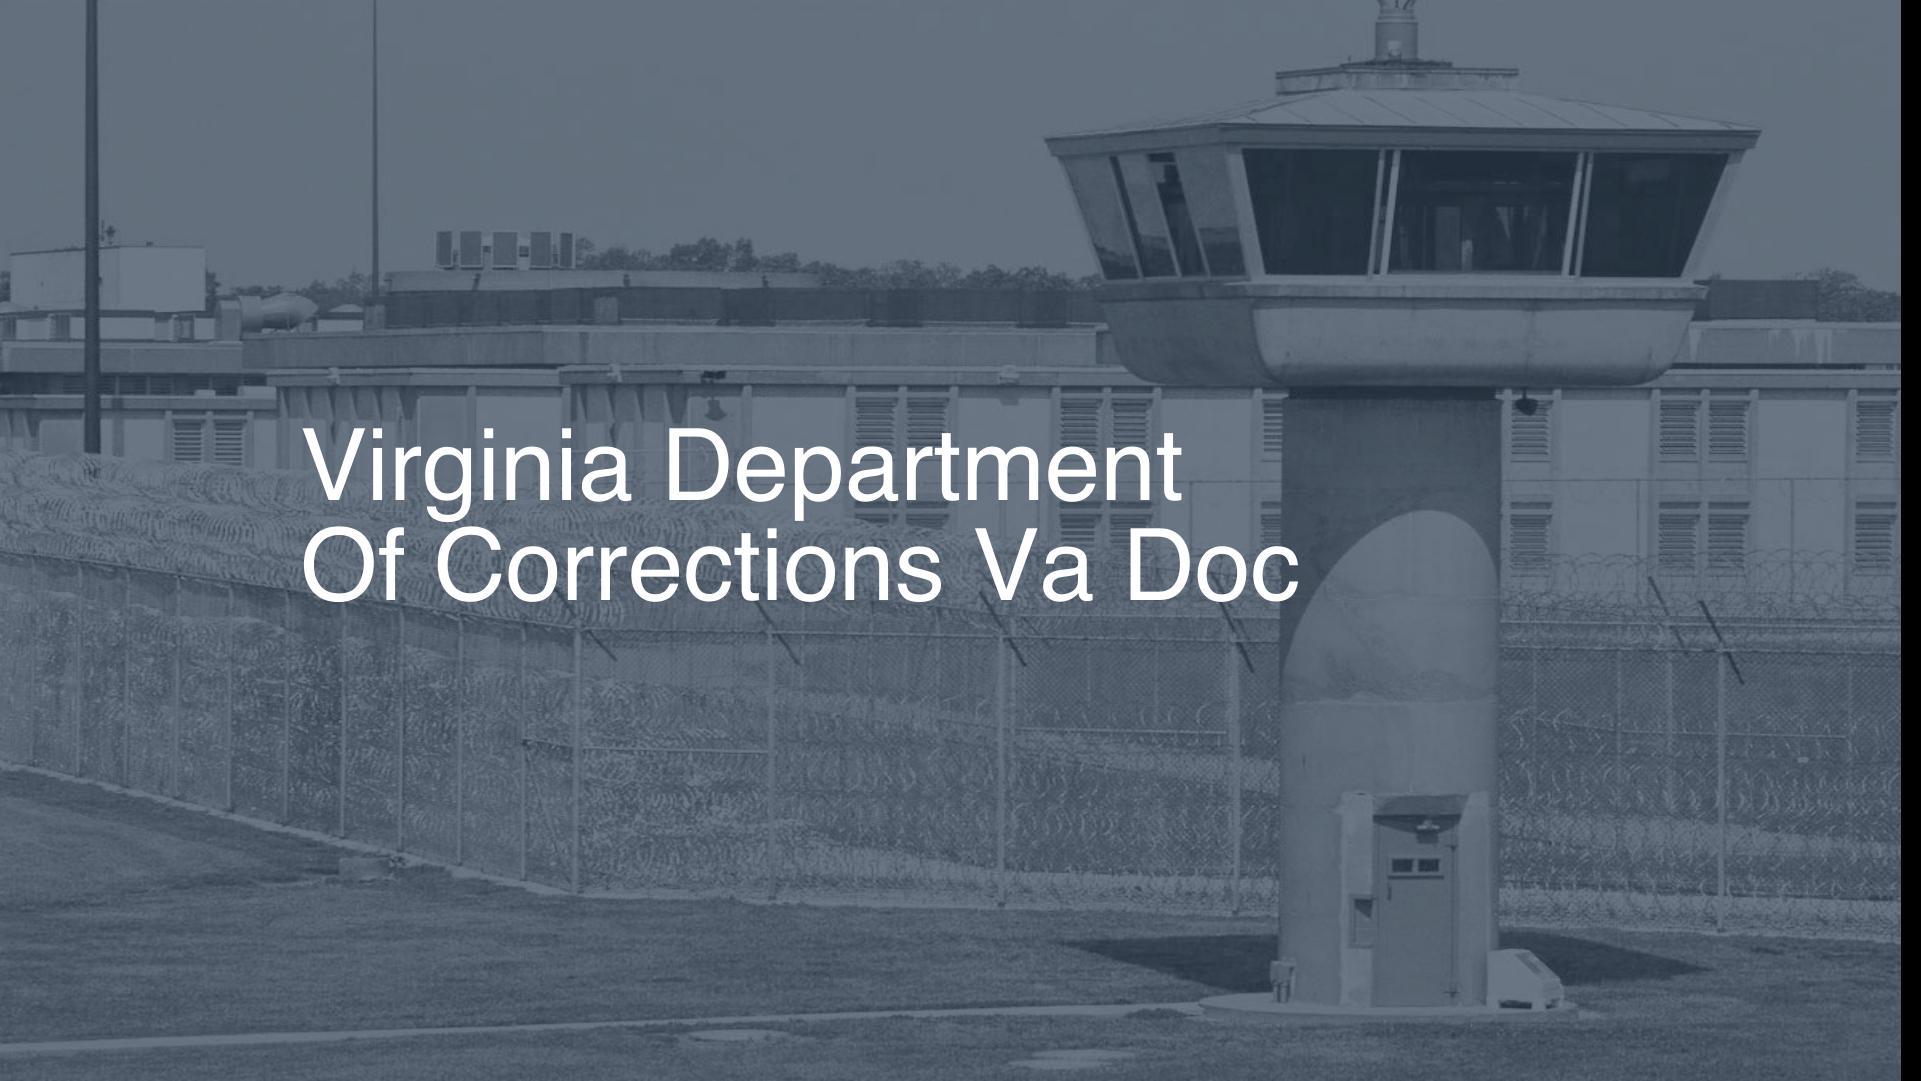 Virginia Department of Corrections (VA